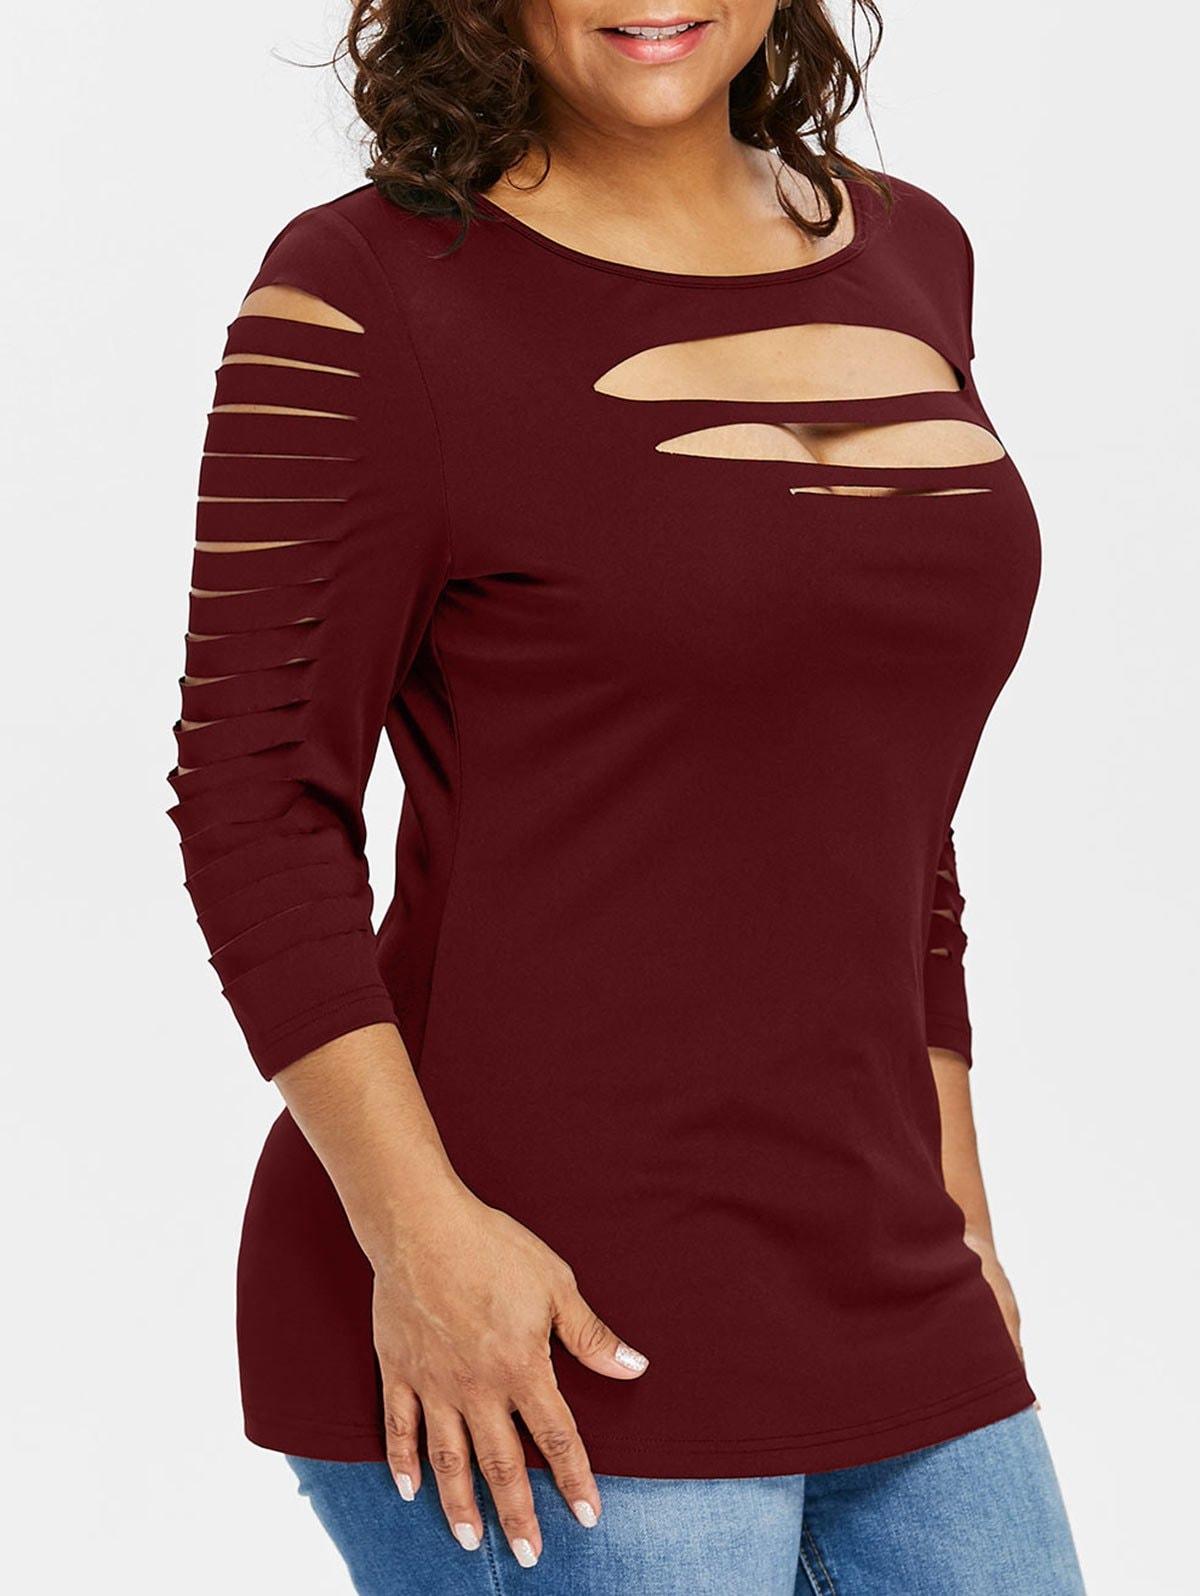 Plus Size Three Quarter Sleeve Ripped T-shirt